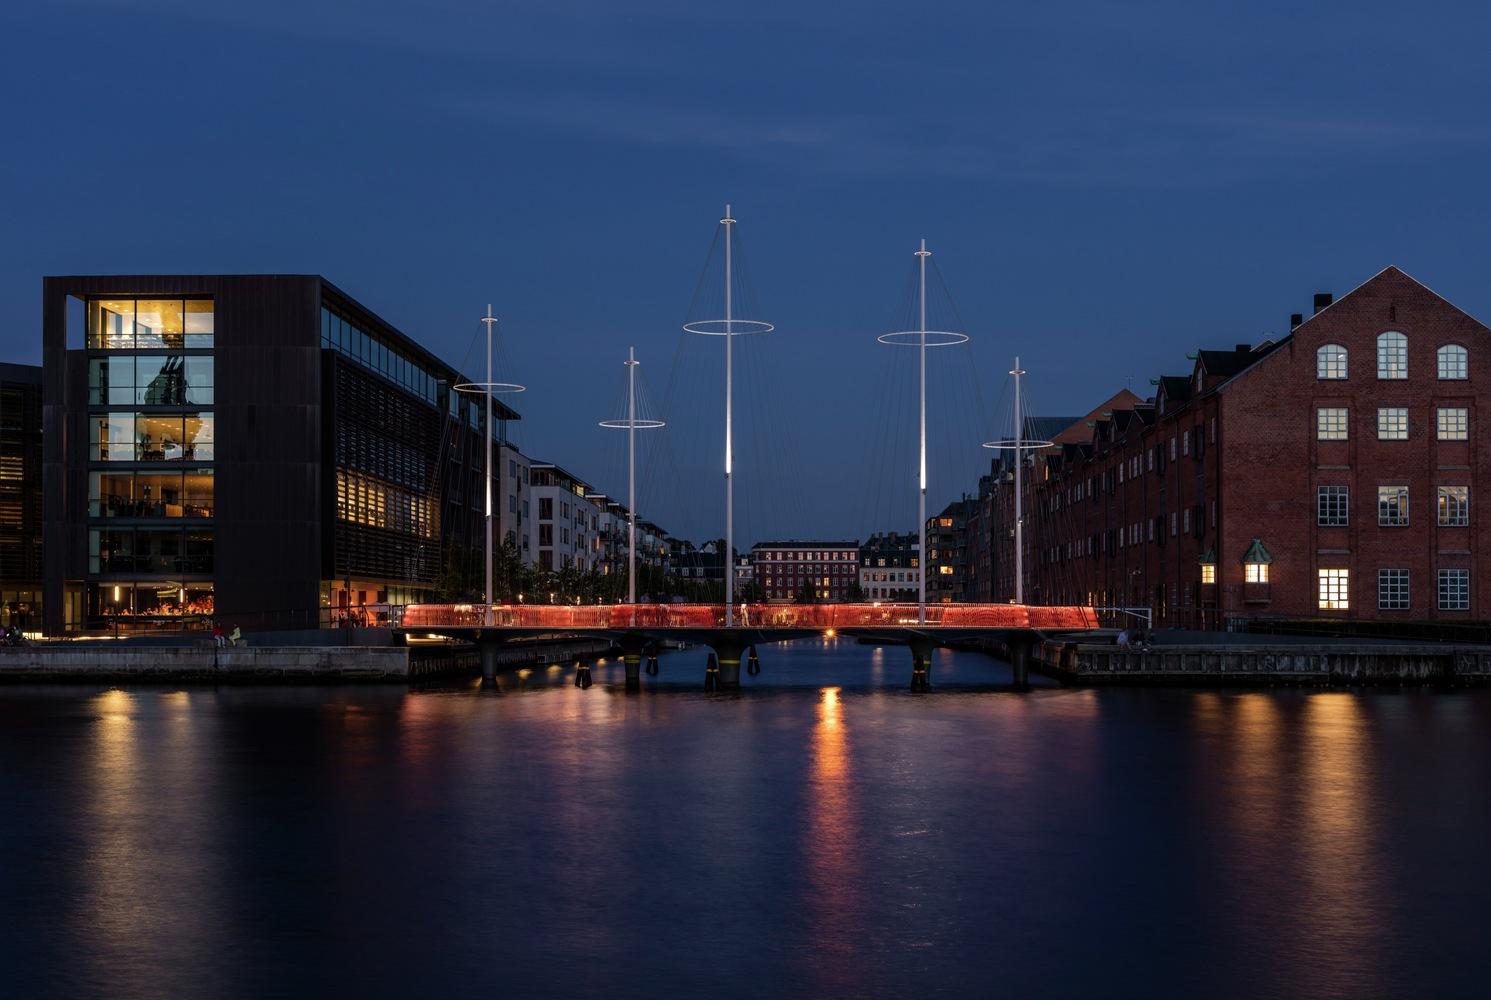 Cirkelbroen Bridge,Olafur Eliasson, Cirkelbroen (The circle bridge), 2015. Christianshavns Kanal, Copenhagen. Photo: Anders Sune Berg. A gift from Nordea-fonden to the city of Copenhagen.